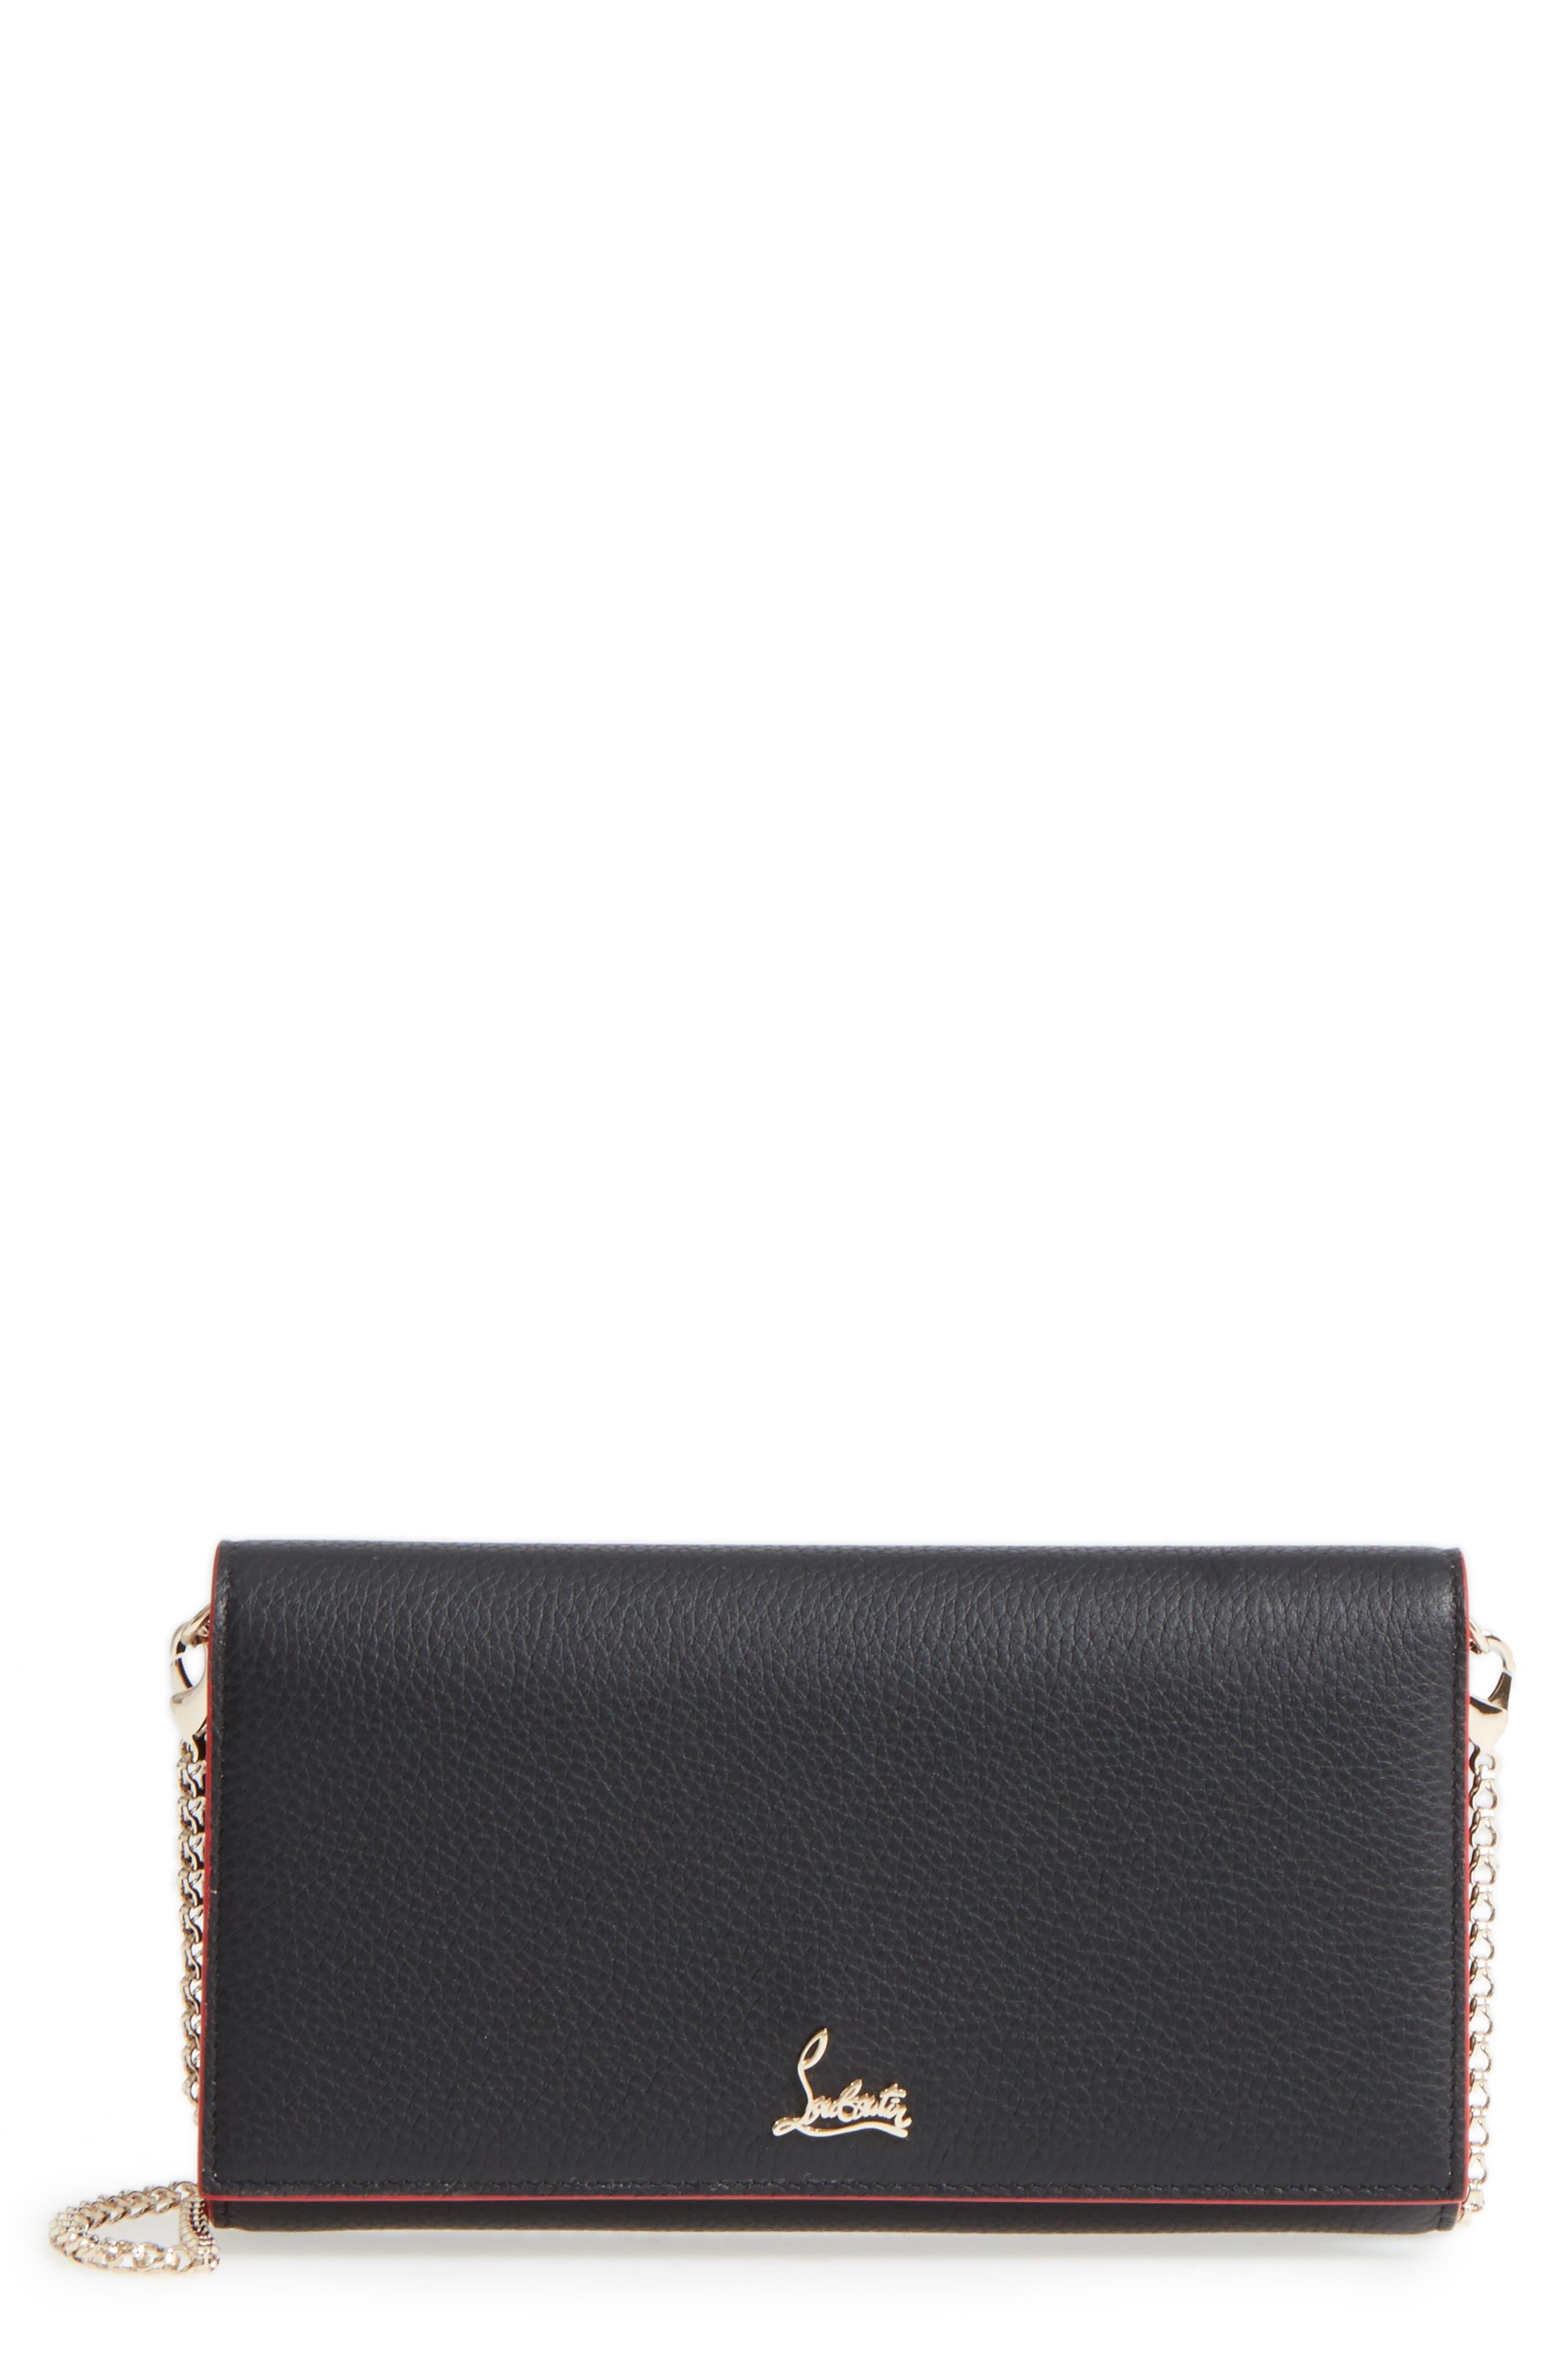 CHRISTIAN LOUBOUTIN Boudoir Calfskin Leather Wallet, Main, color, 012